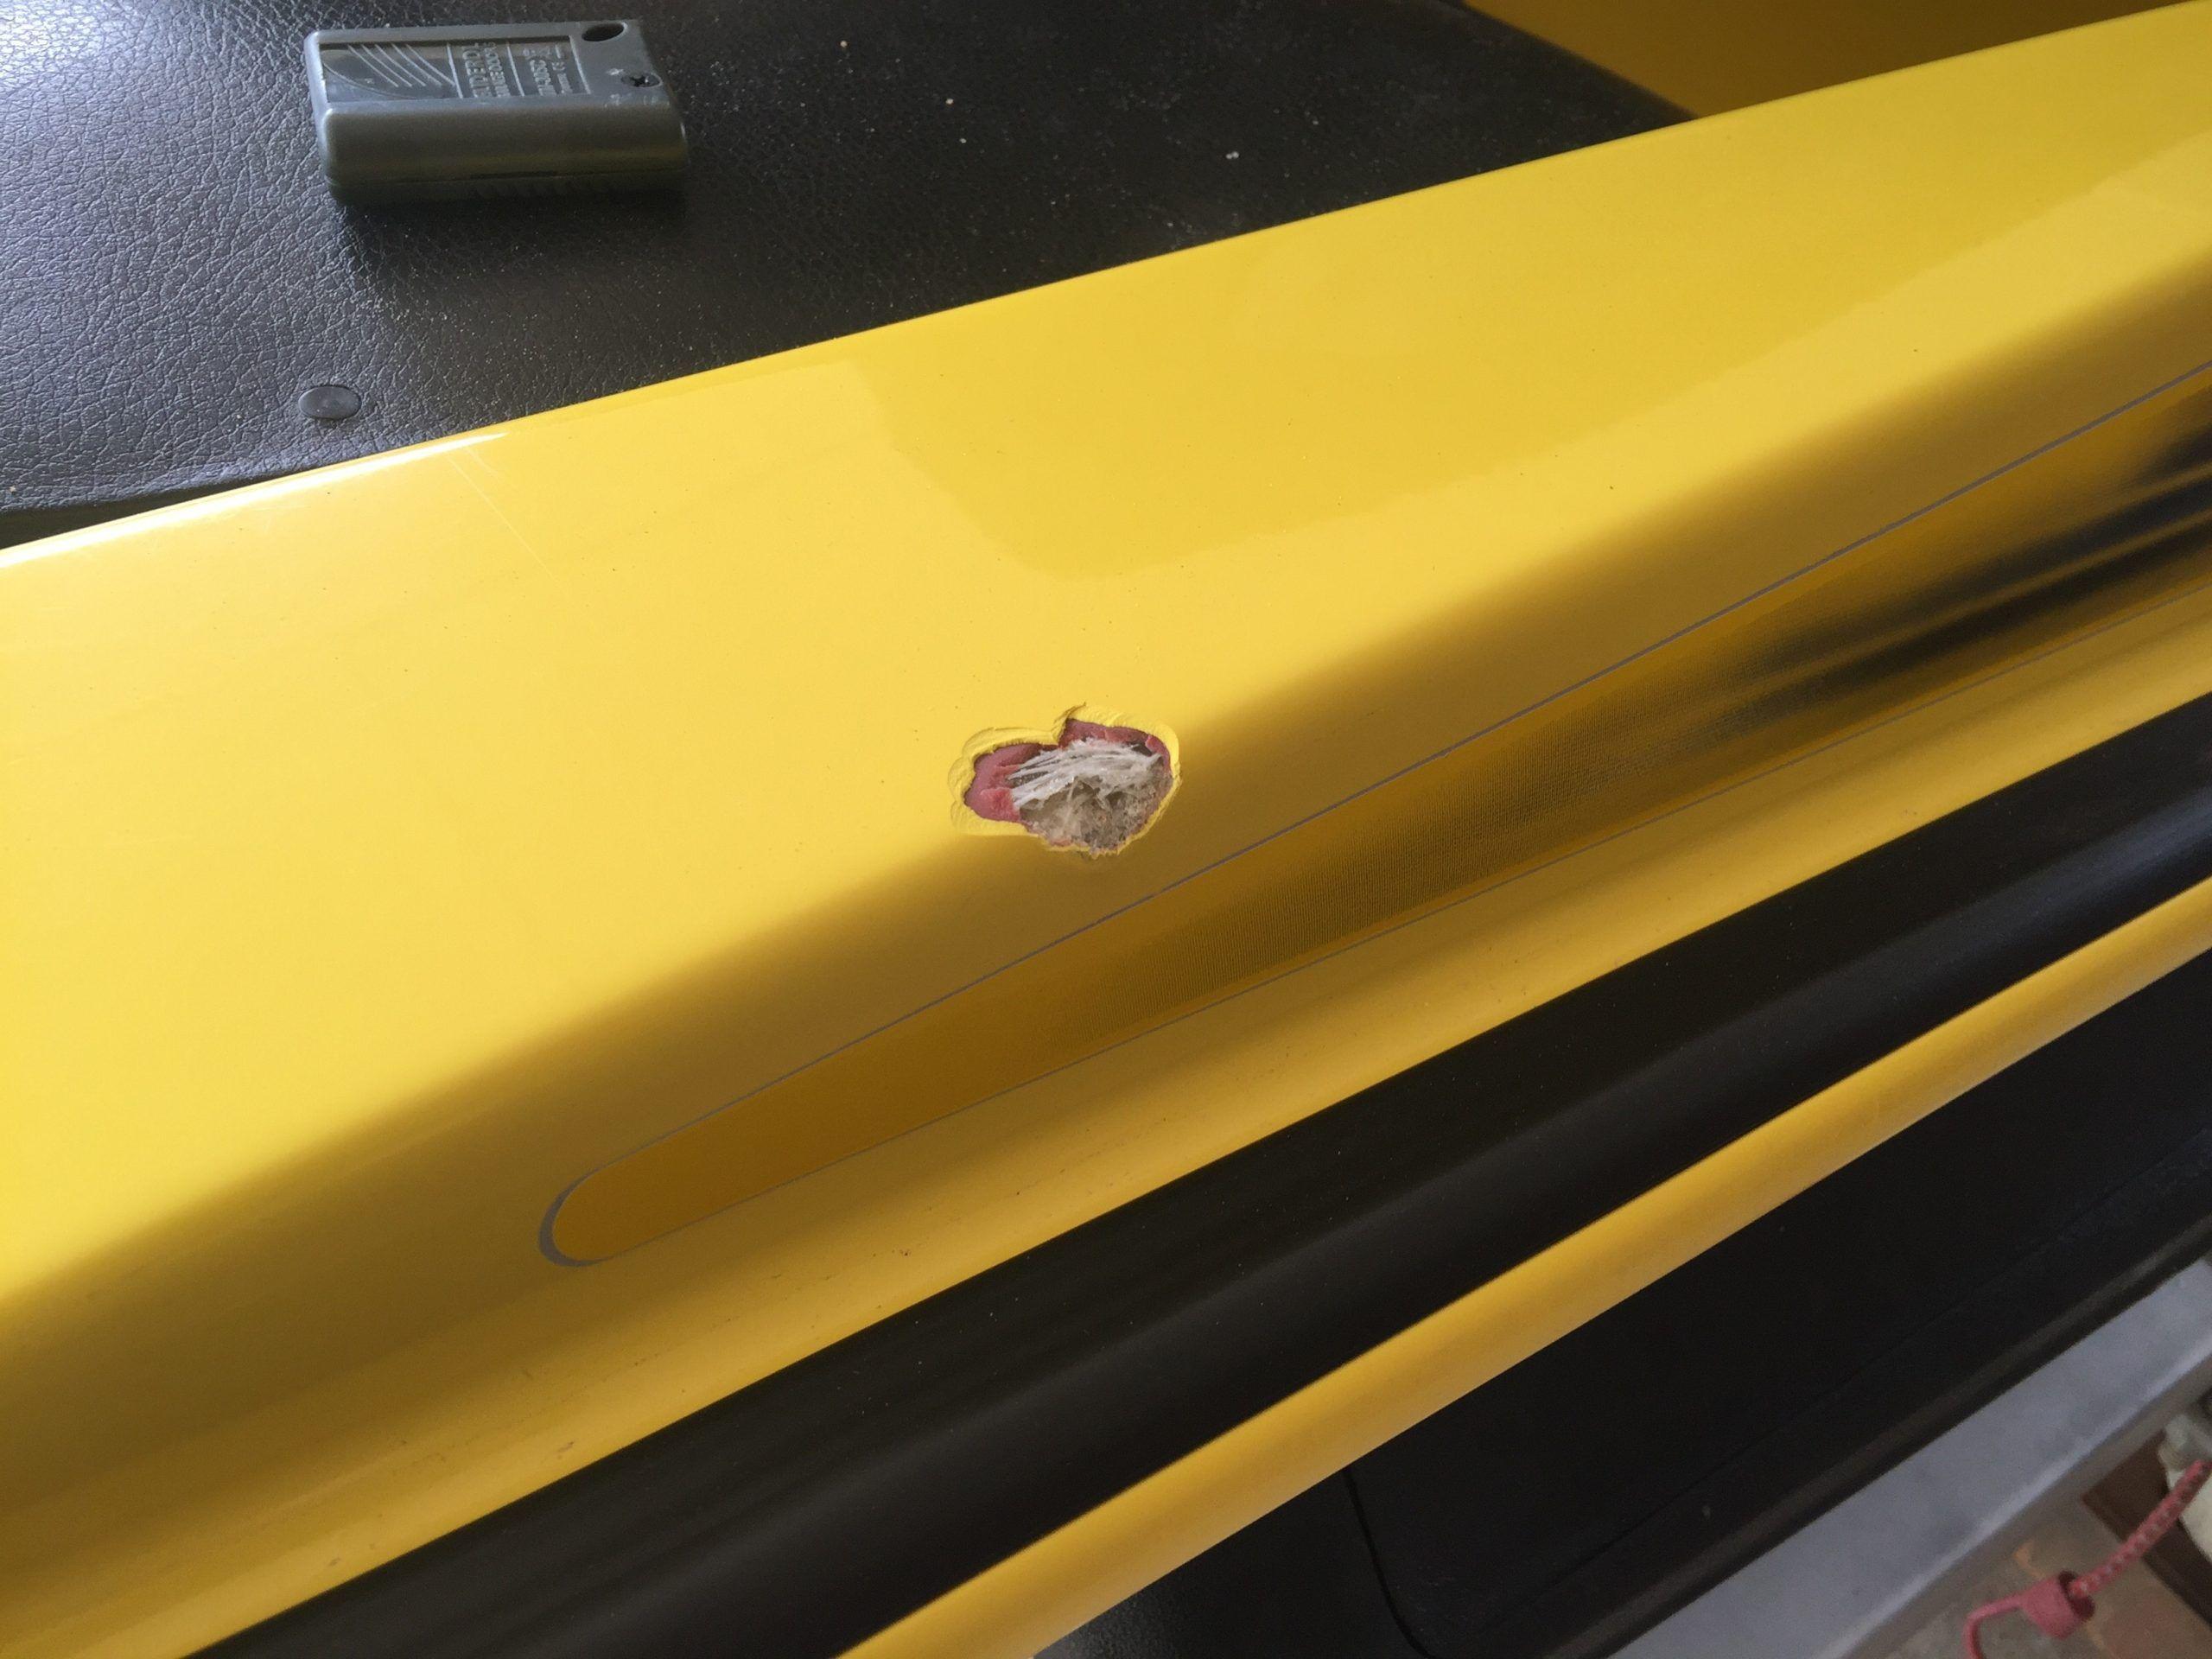 Jetski paint chip repair BEFORE close up